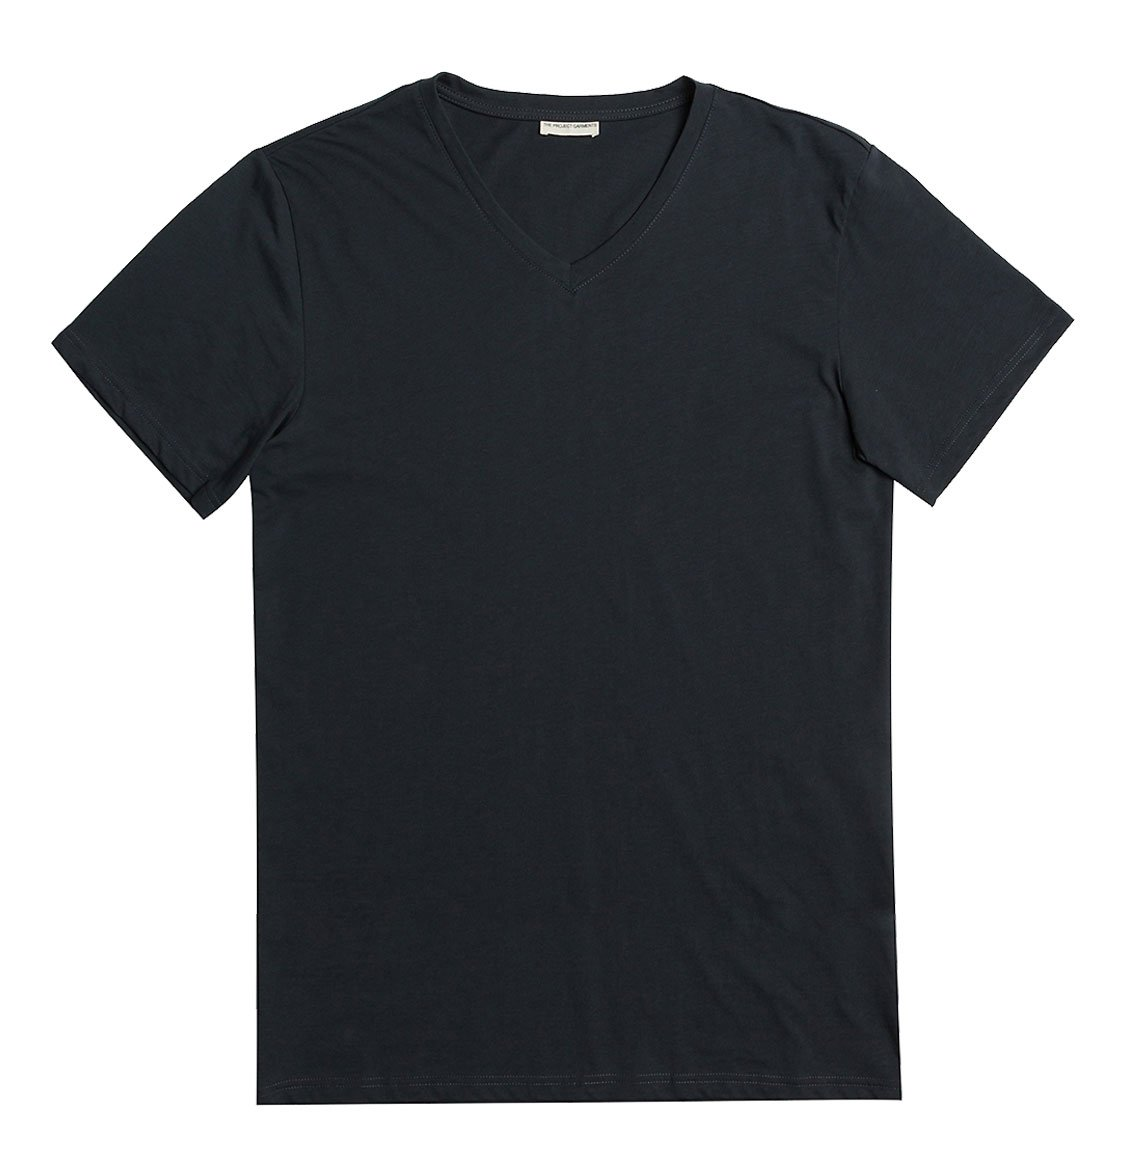 The Project Garments Organic Cotton V-neck T-shirt Charcoal Grey